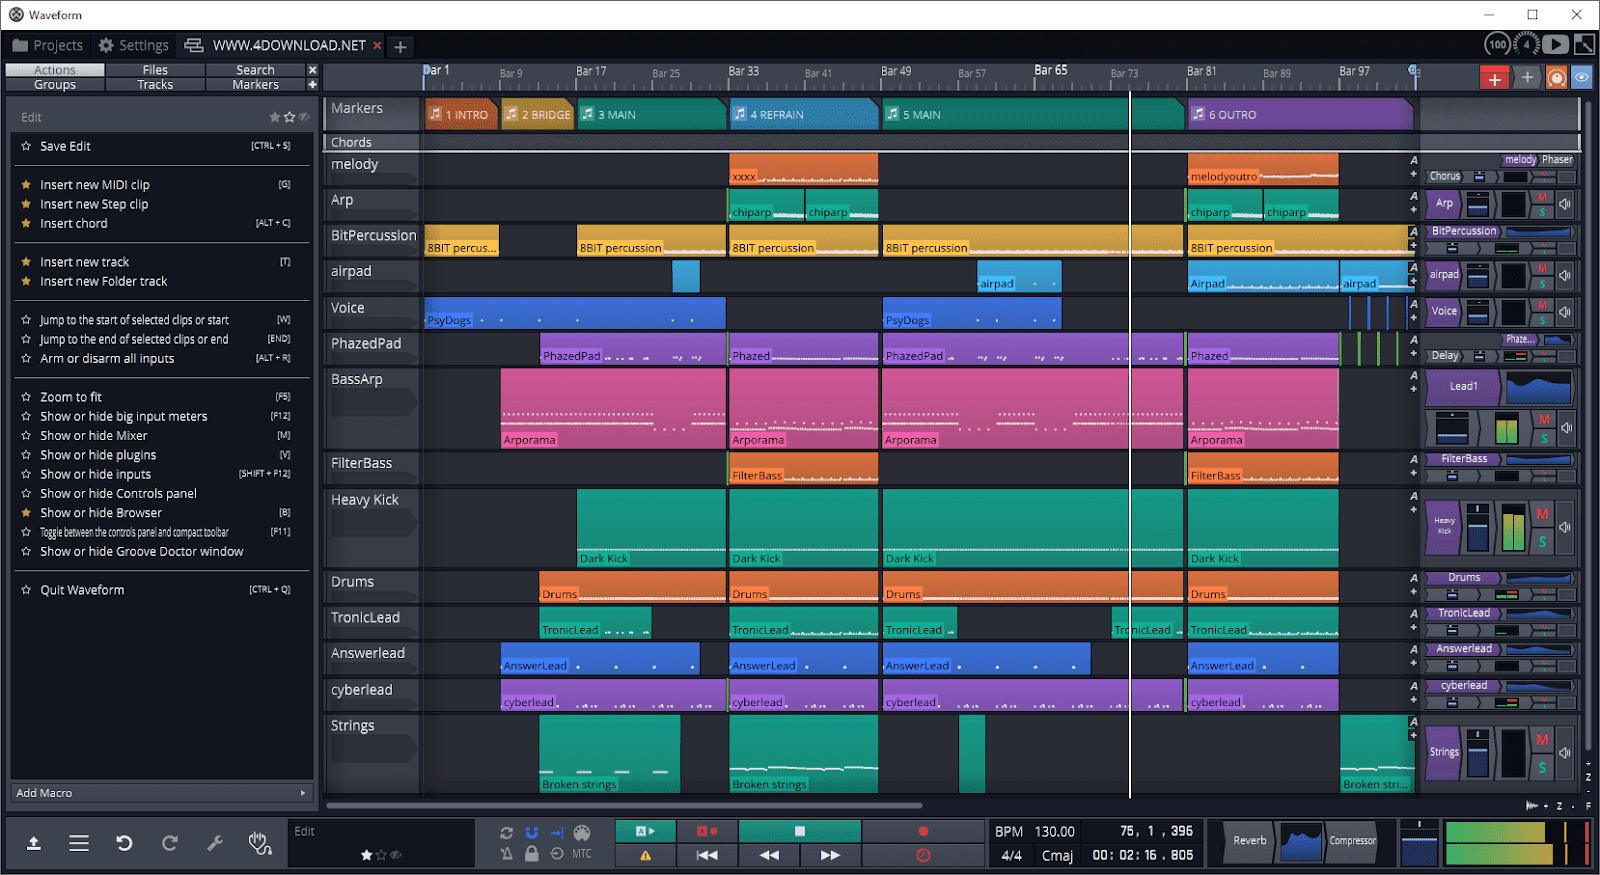 Tracktion Waveform 10 Full version FOR FREE